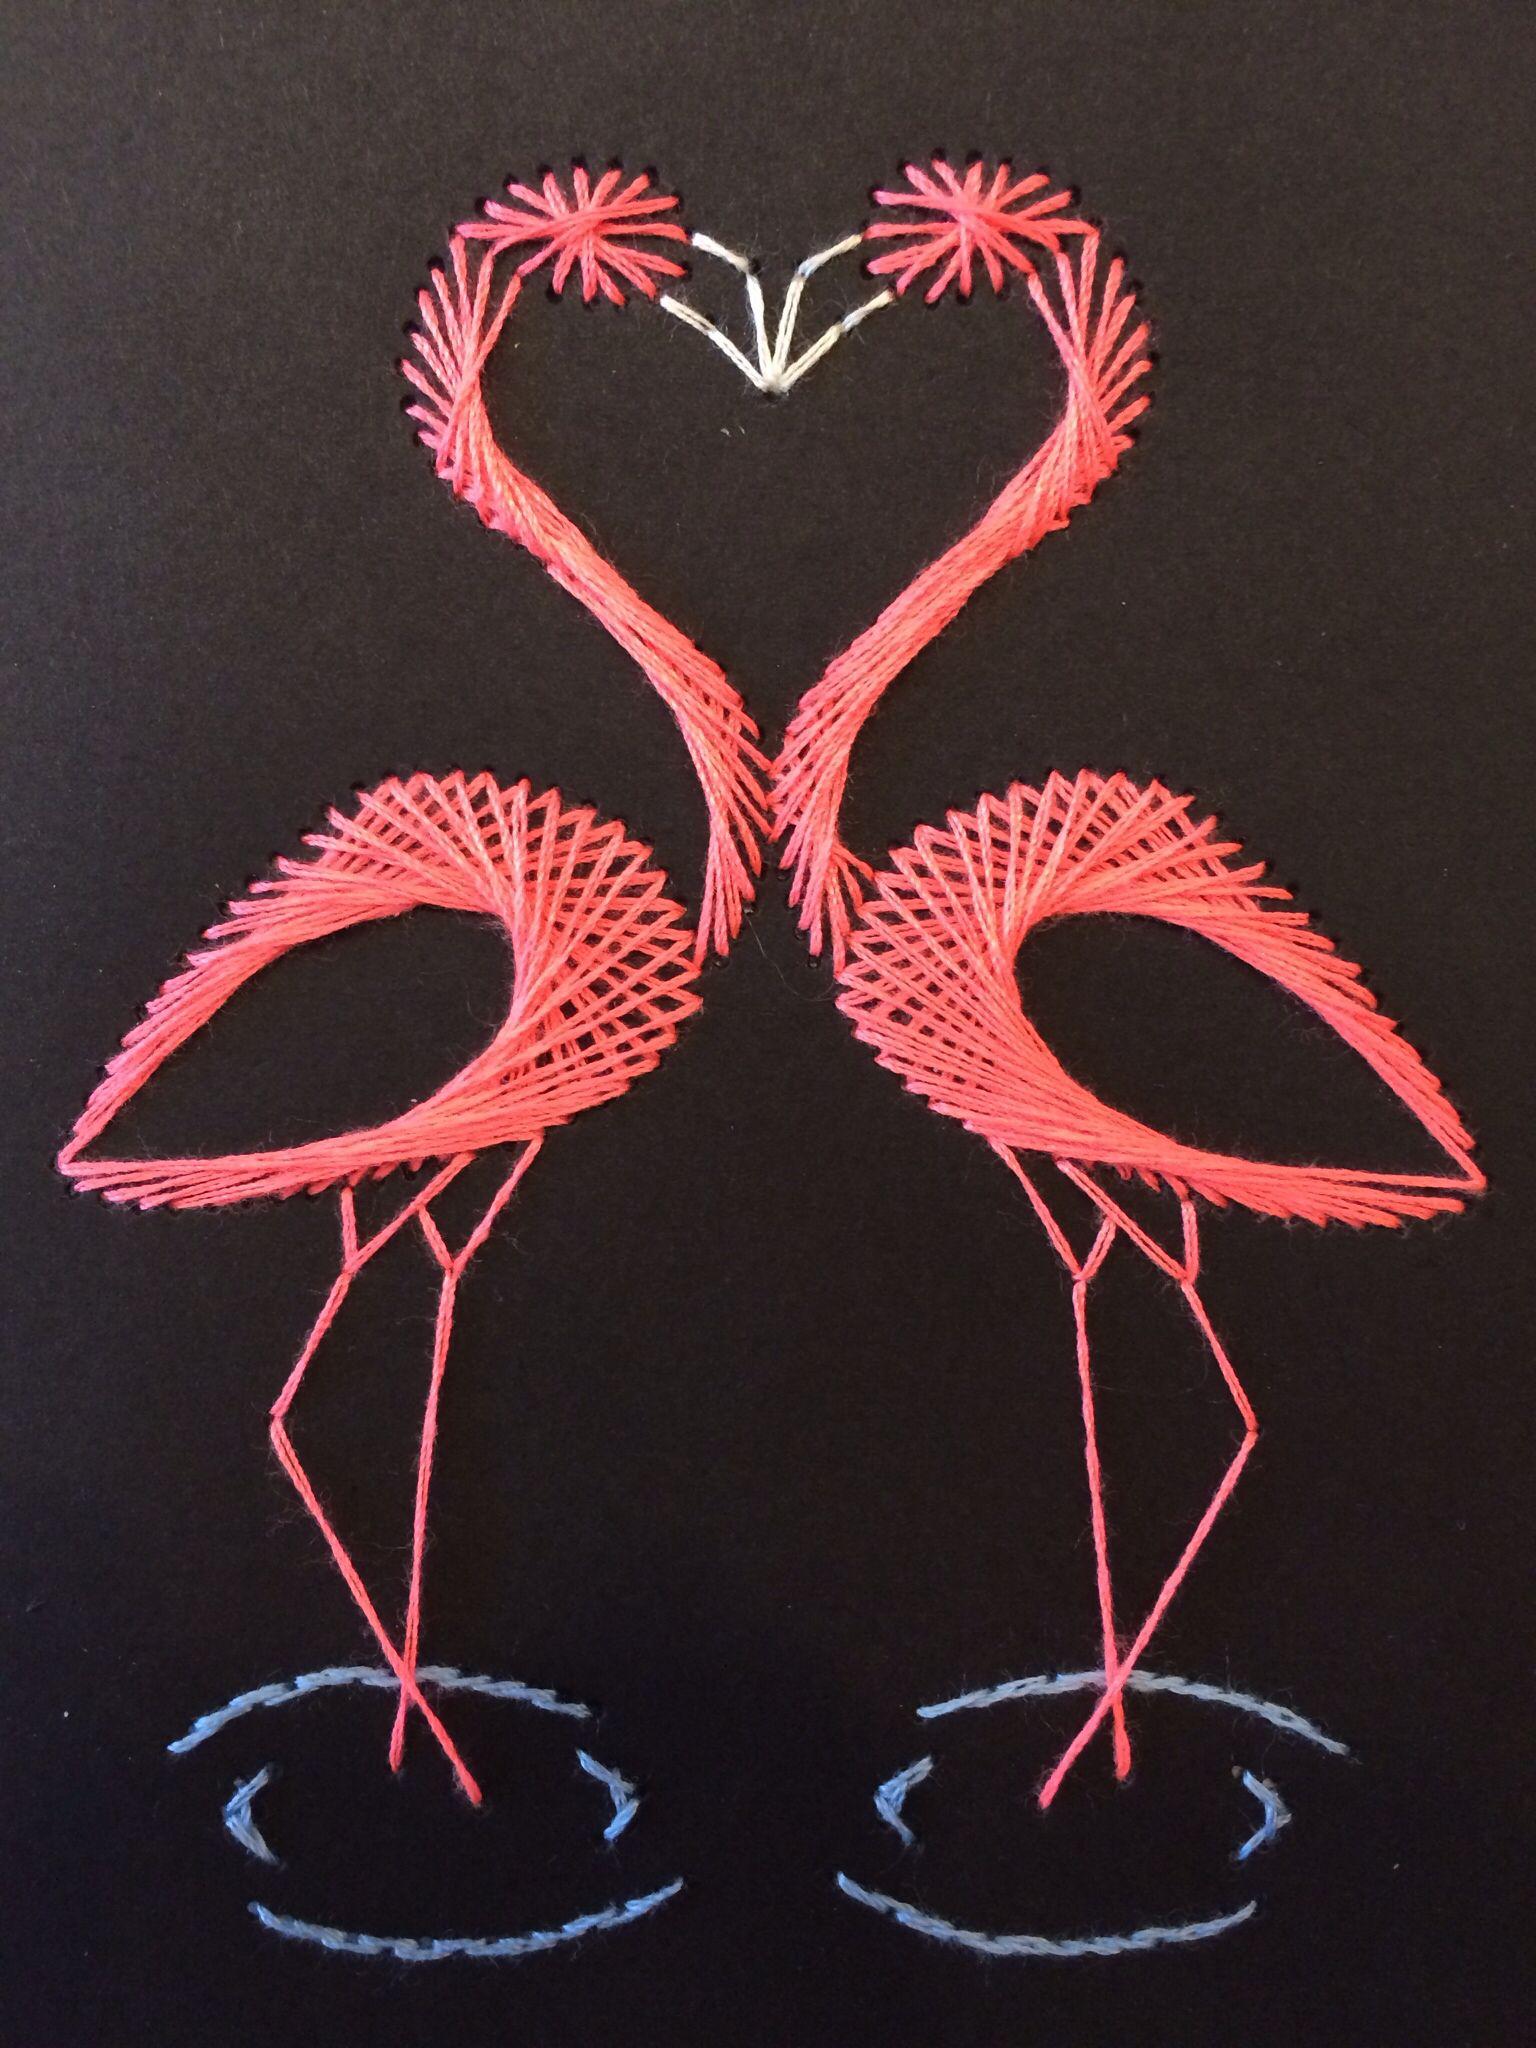 flamingo stitch card fadengrafik pinterest fadenkunst fadengrafik und selbermachen basteln. Black Bedroom Furniture Sets. Home Design Ideas